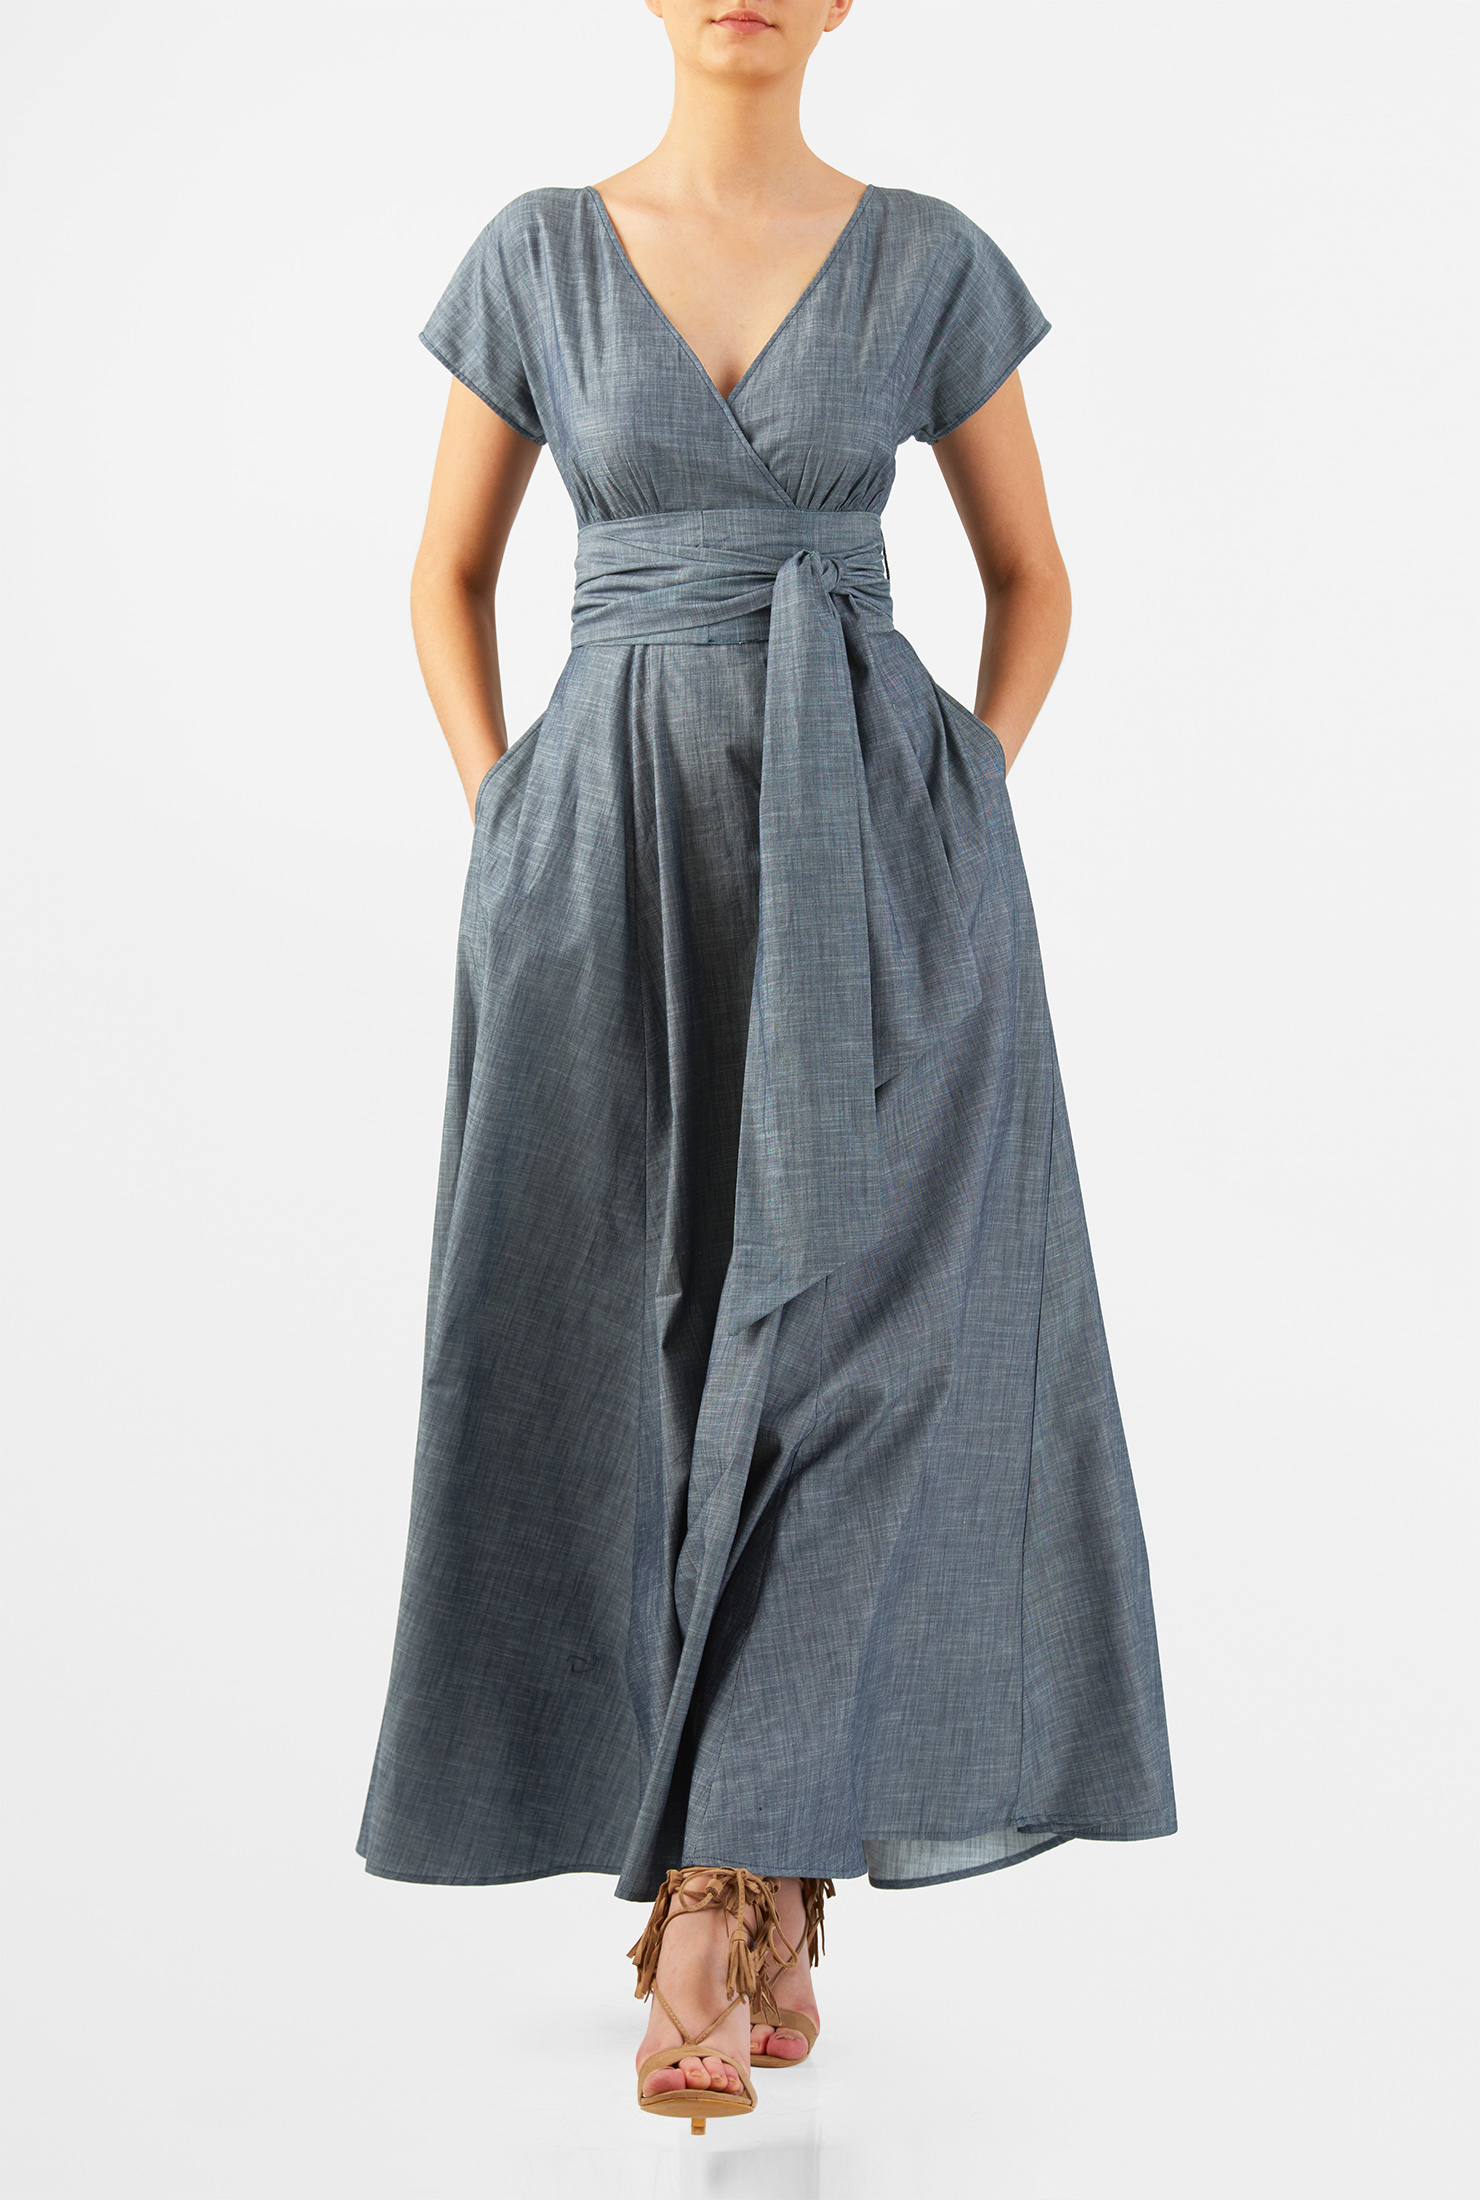 Eshakti Womens Sash Tie Cotton Chambray Maxi Dress